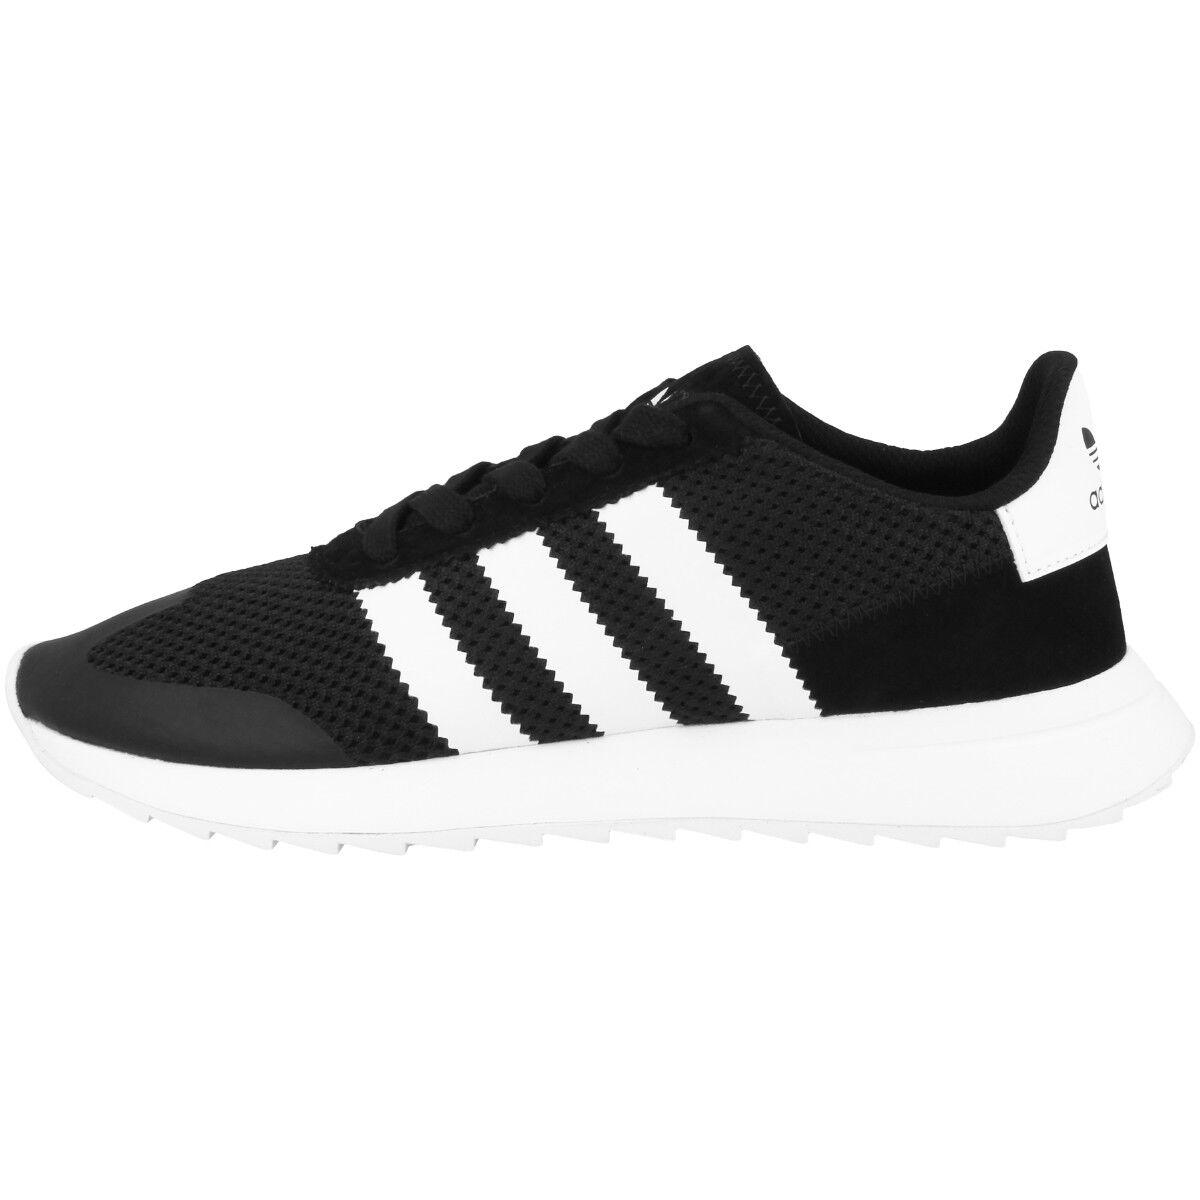 Adidas FLB FLB FLB damen Schuhe Damen Originals Turnschuhe Turnschuhe schwarz Weiß BB5323 57bf75